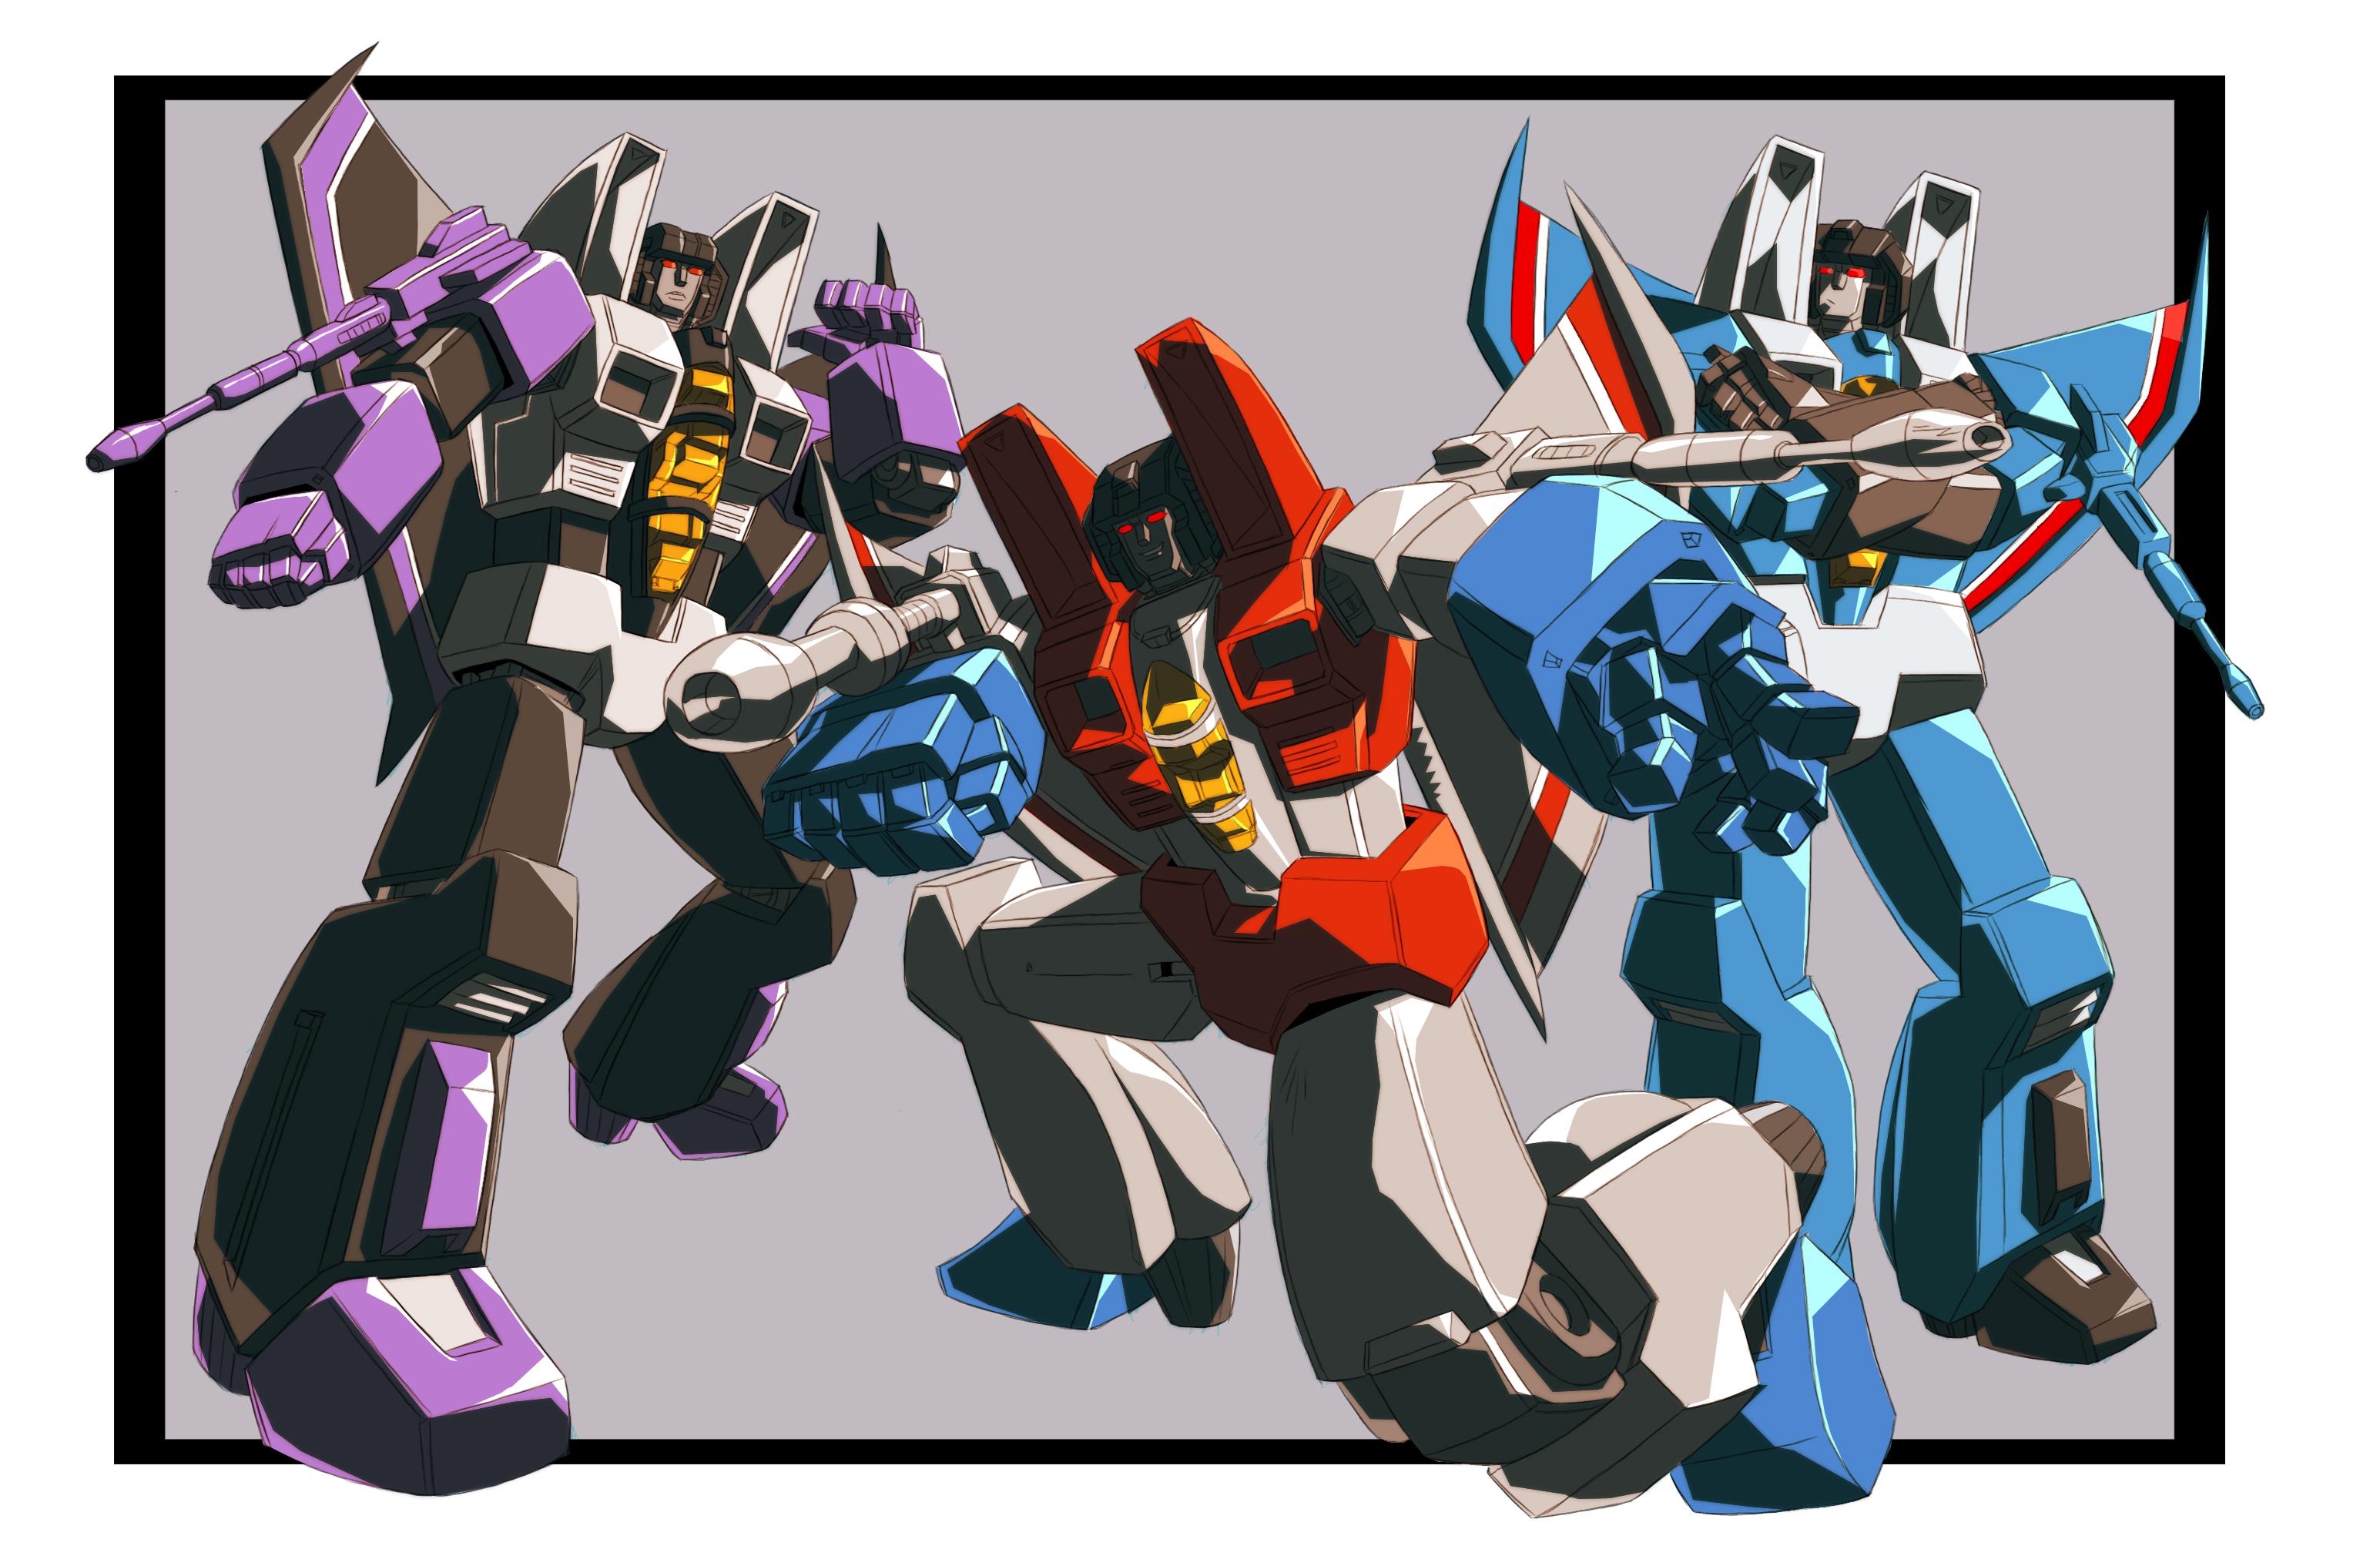 Transformers Fall Of Cybertron Wallpaper Hd Transformers Full Hd Wallpaper And Background Image